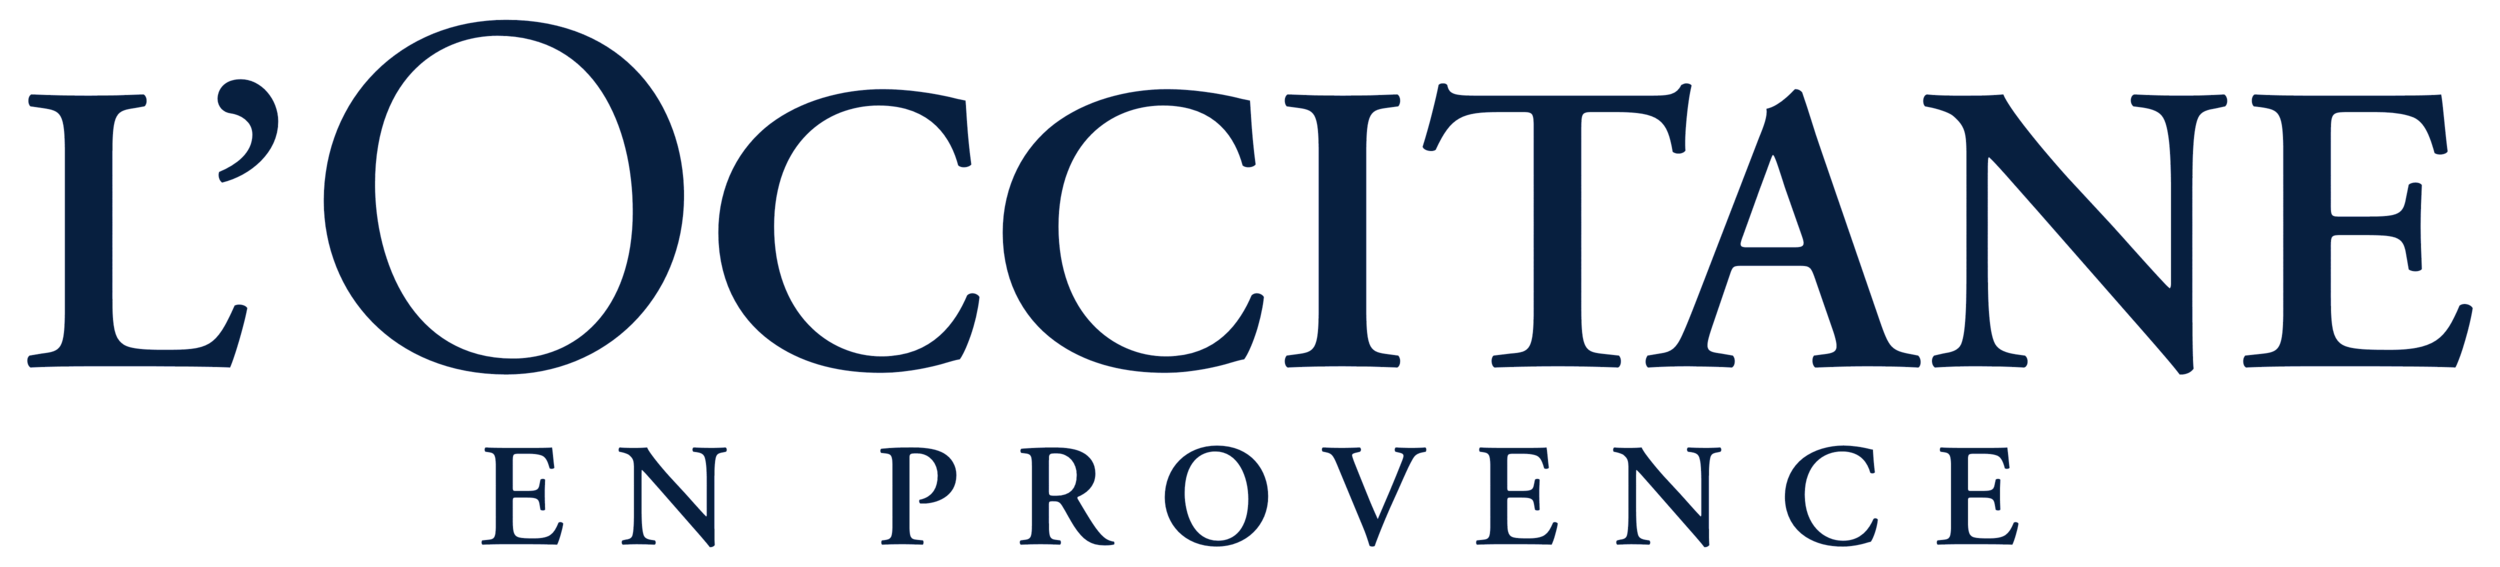 LOccitane_en_Provence_logo_logo.png